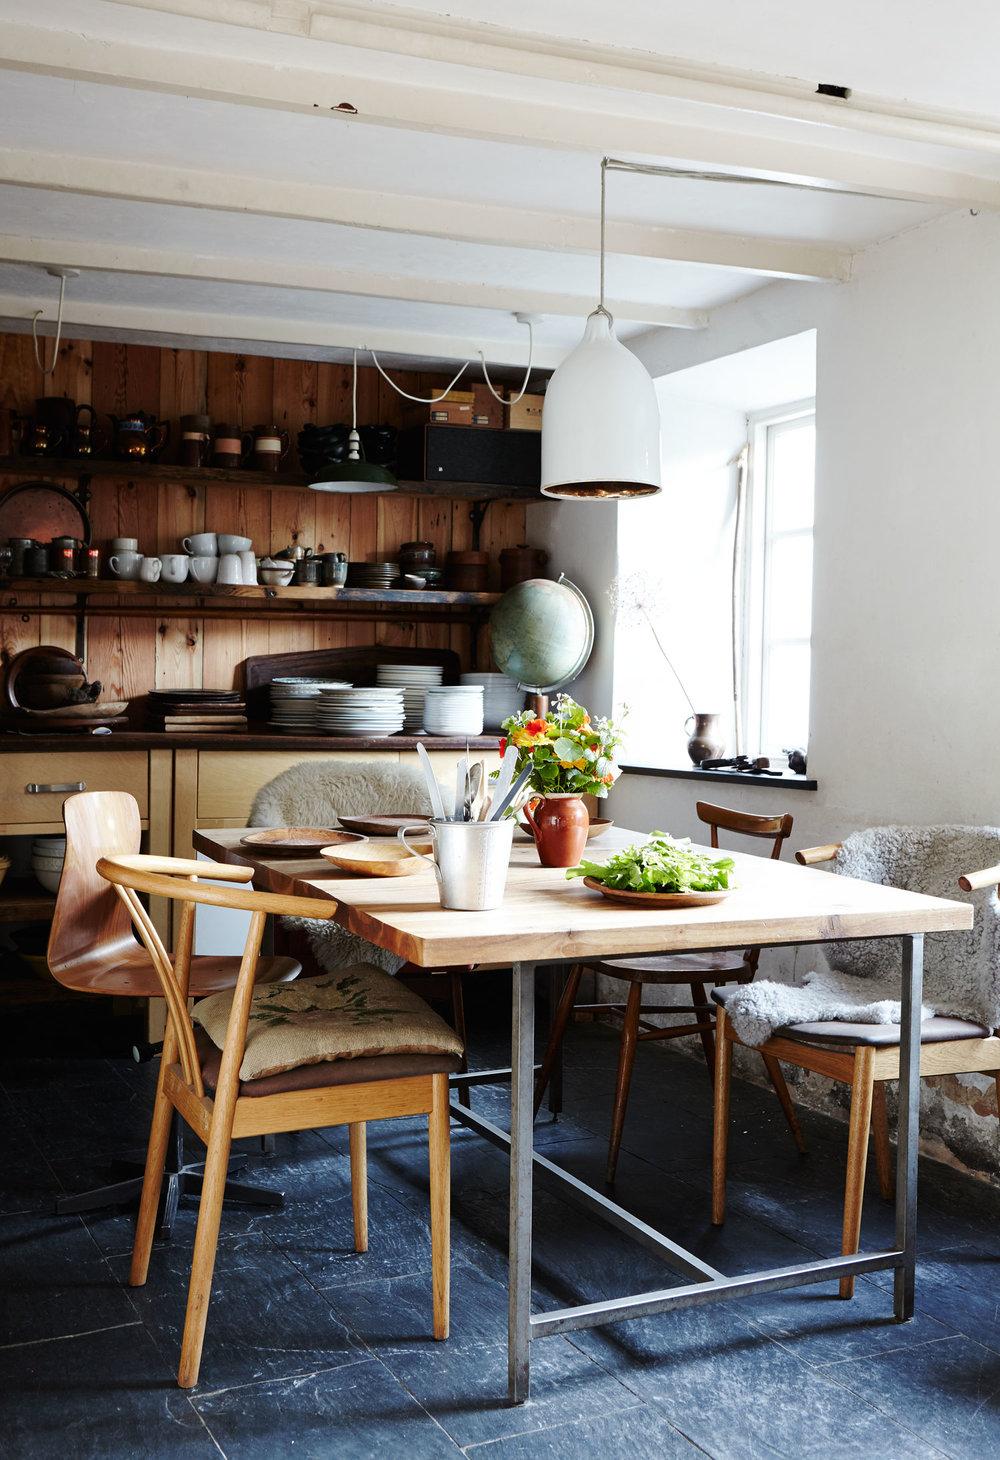 welsh_farmhouse_kitchen.jpg